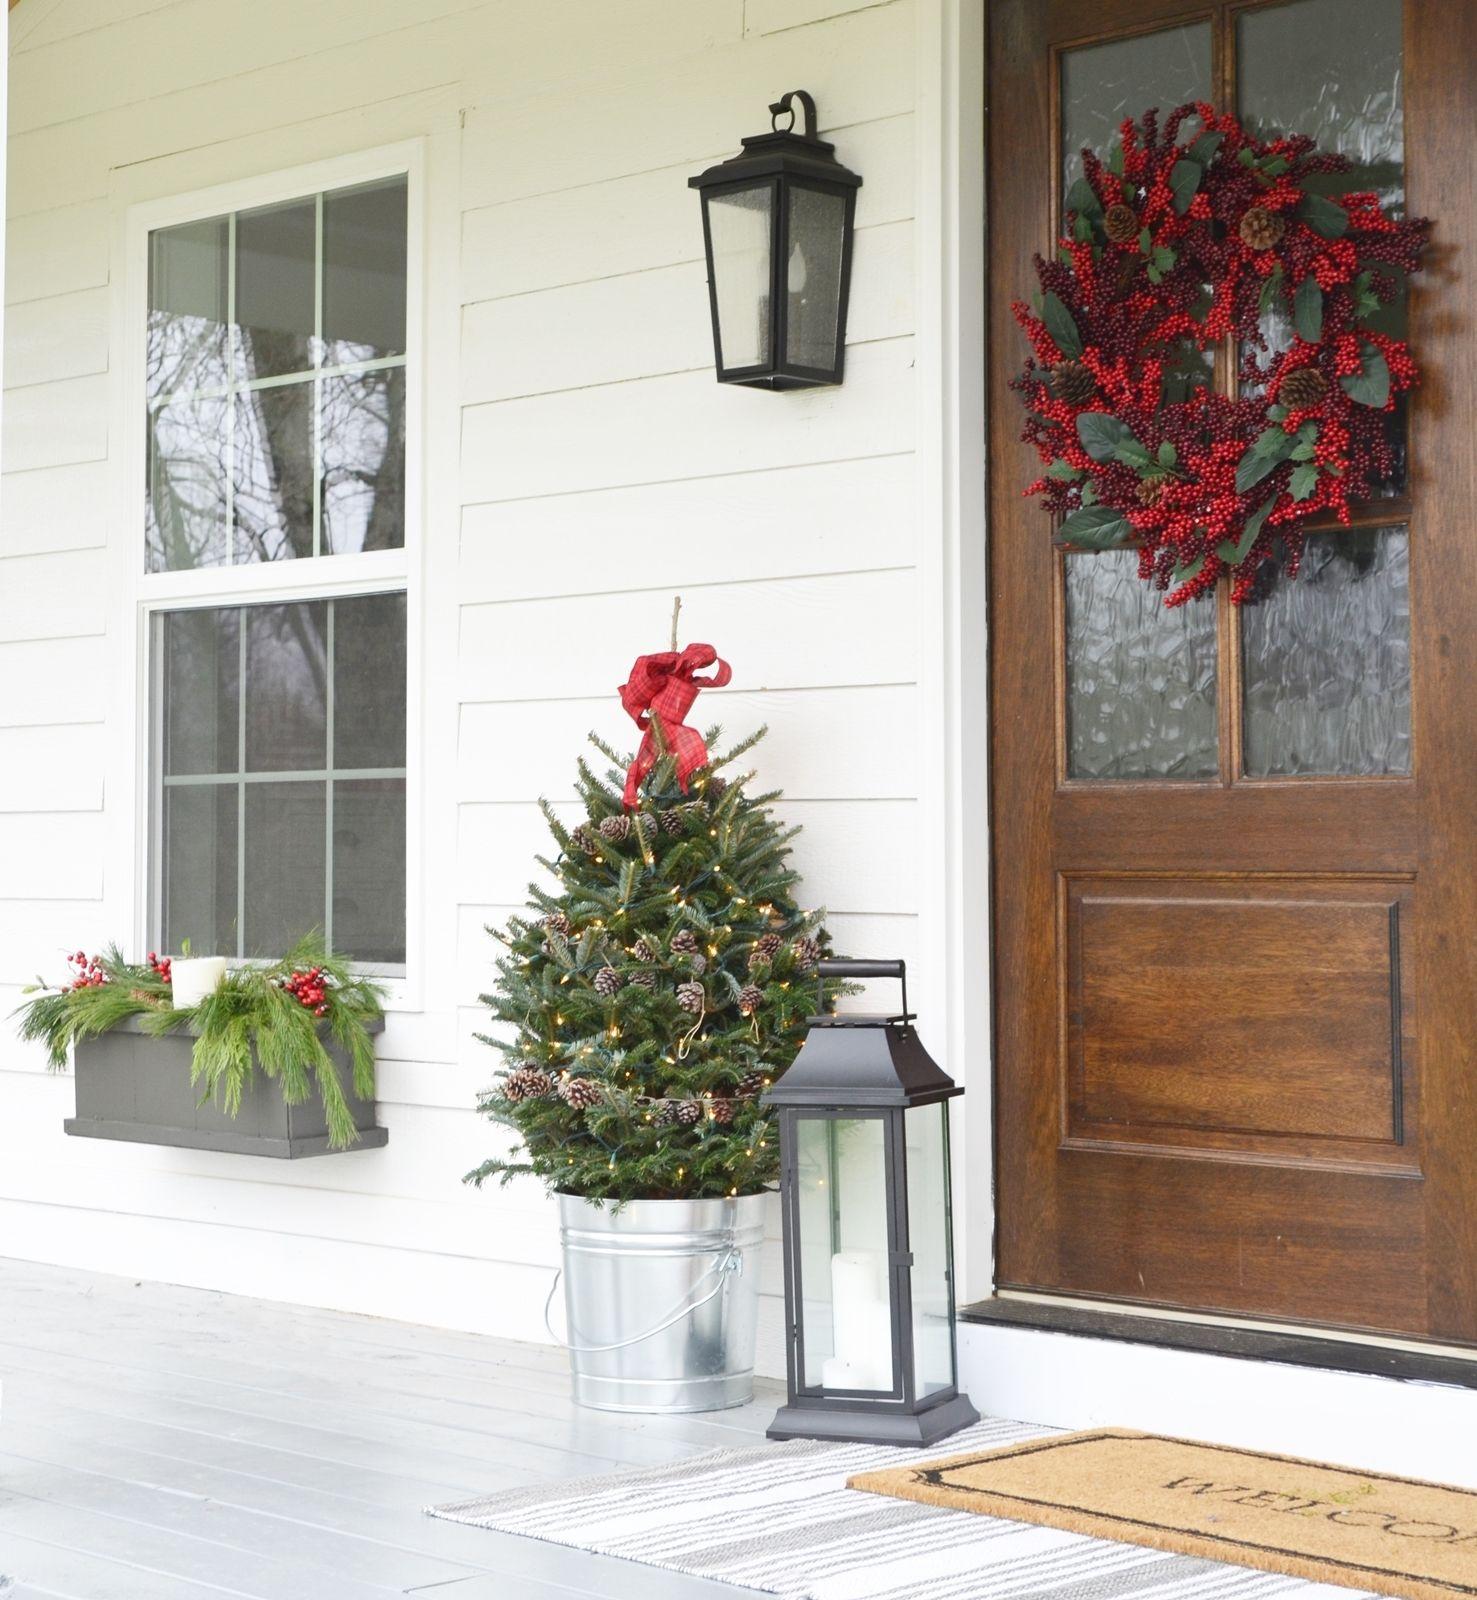 Our 8 Best Spring Decor Ideas Home Tour: Our Farmhouse Christmas Front Porch